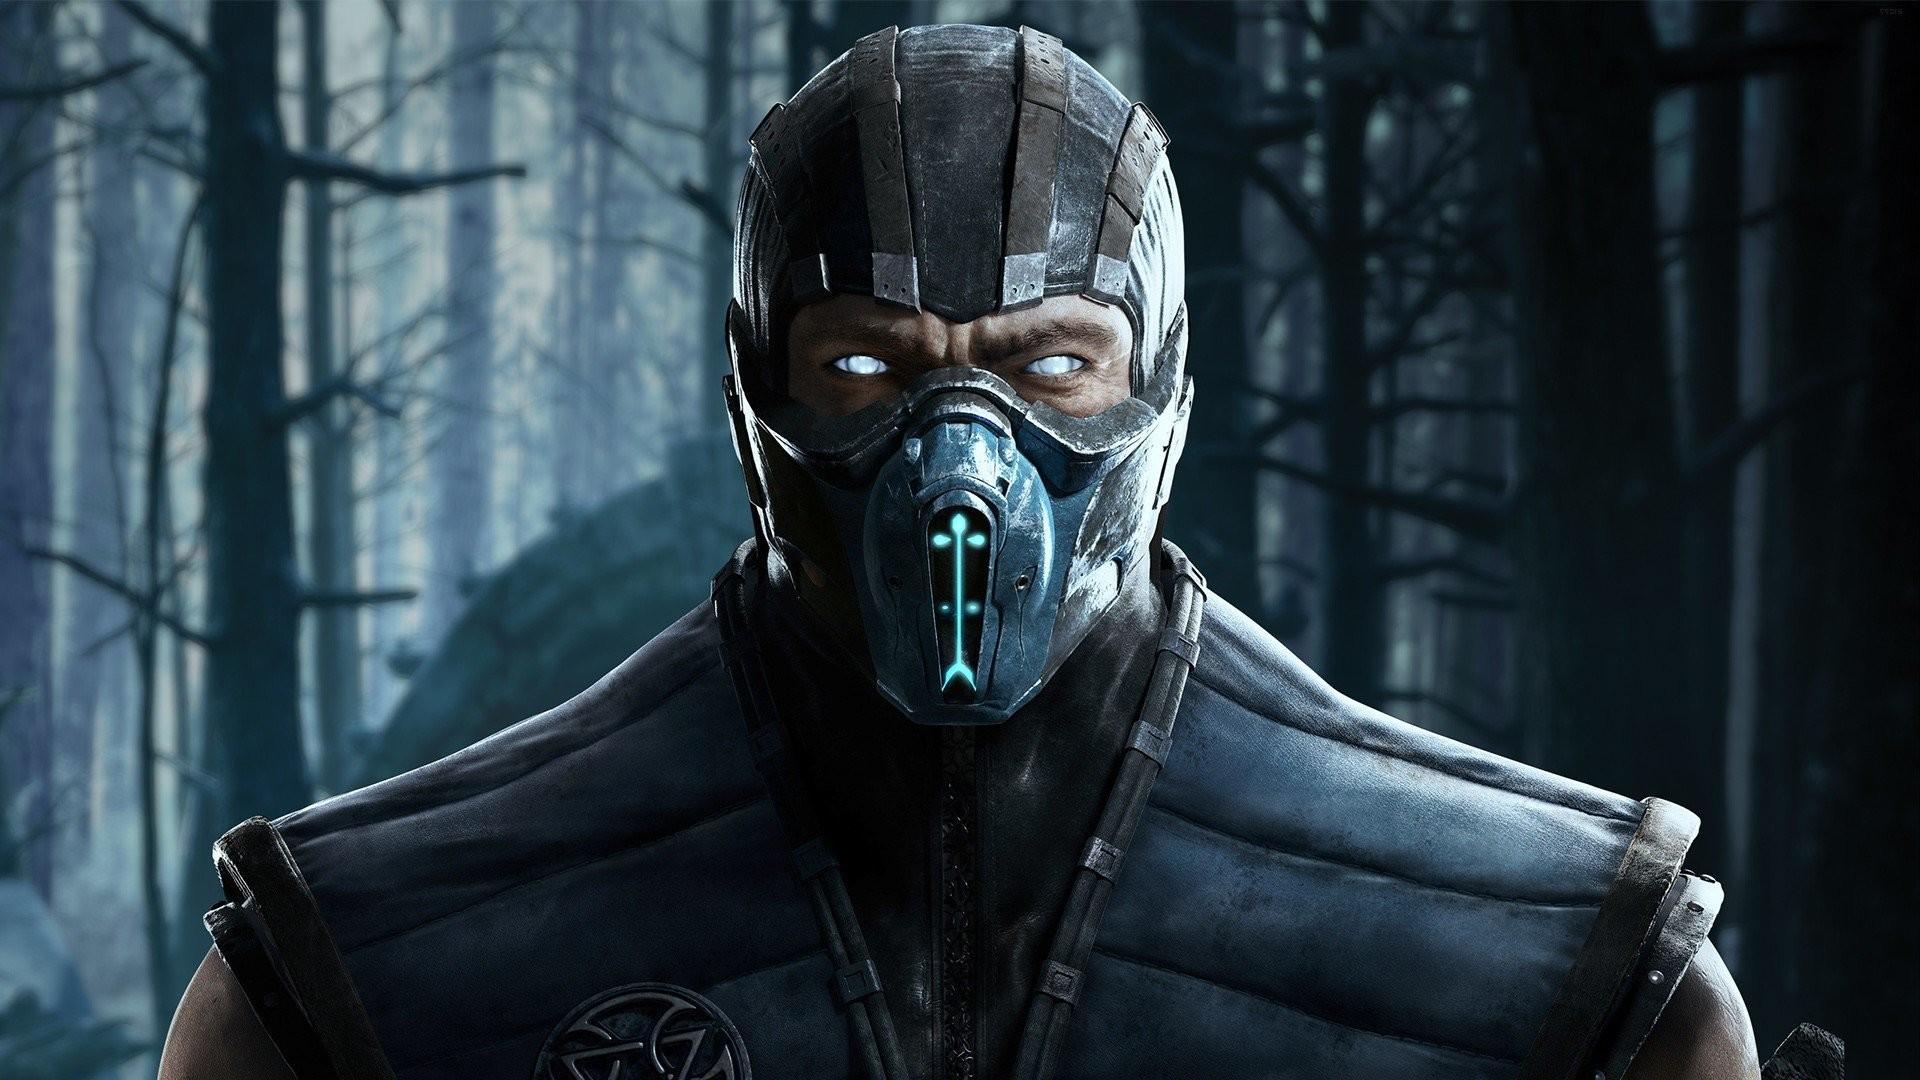 HD Wallpaper   Background ID:770495. Video Game Mortal Kombat X